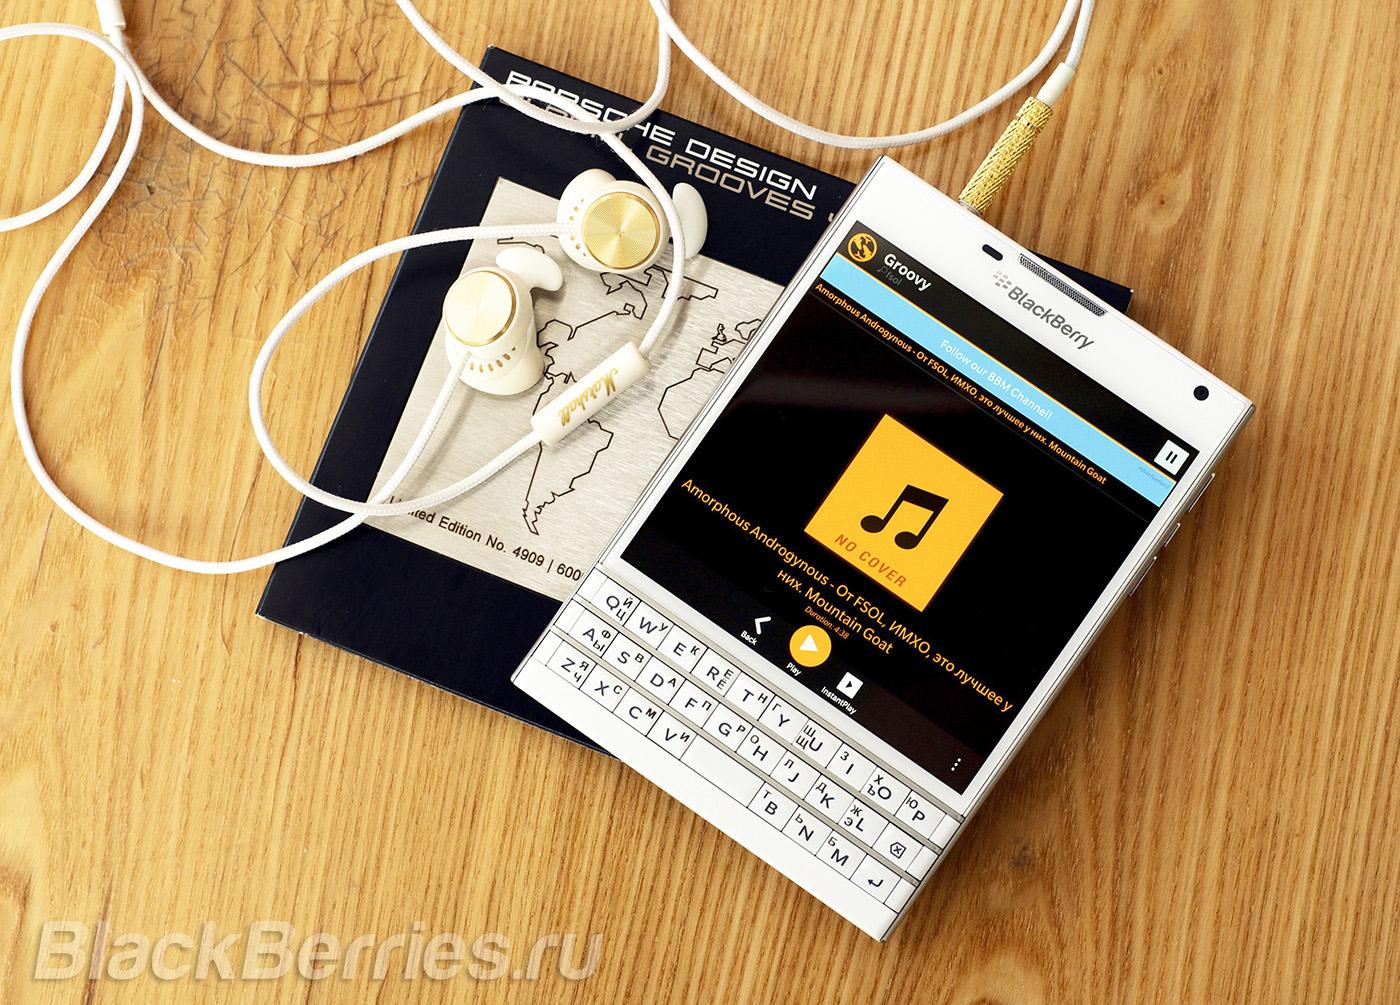 BlackBerry-Passport-Music-Apps-06